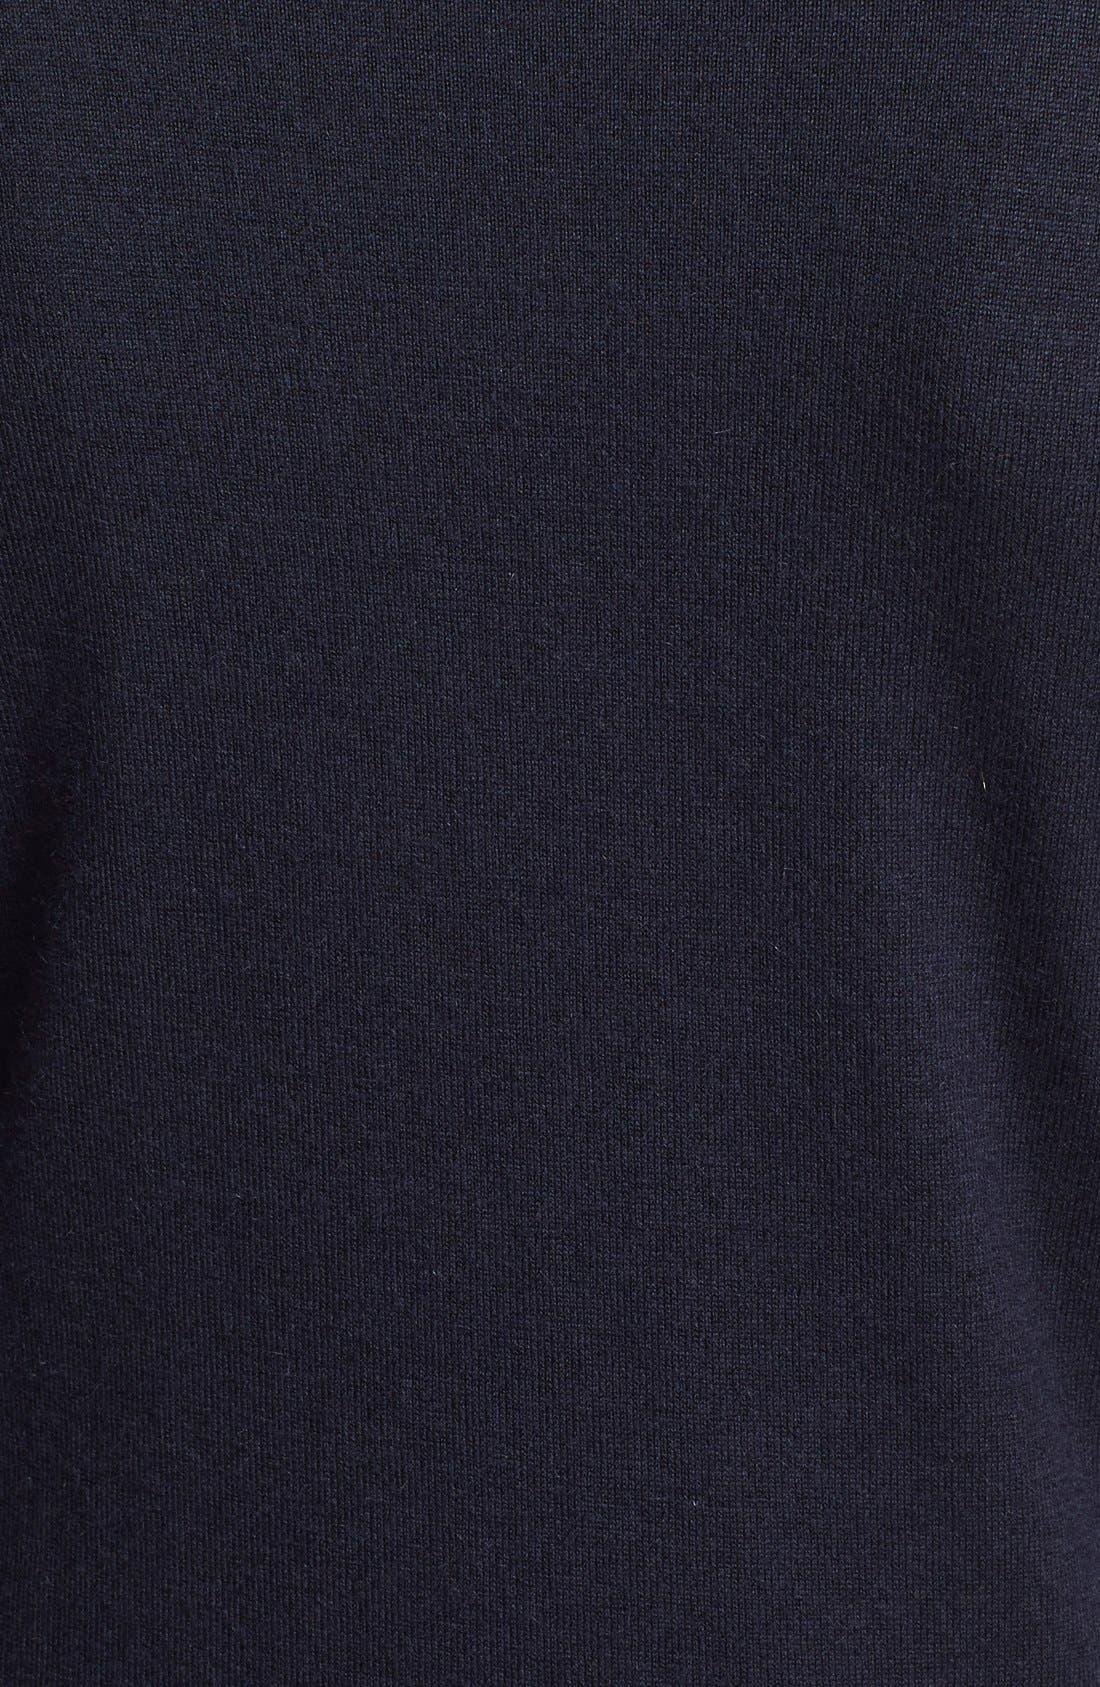 Alternate Image 3  - Theory 'Perfect' Cashmere Blend Crewneck Sweater